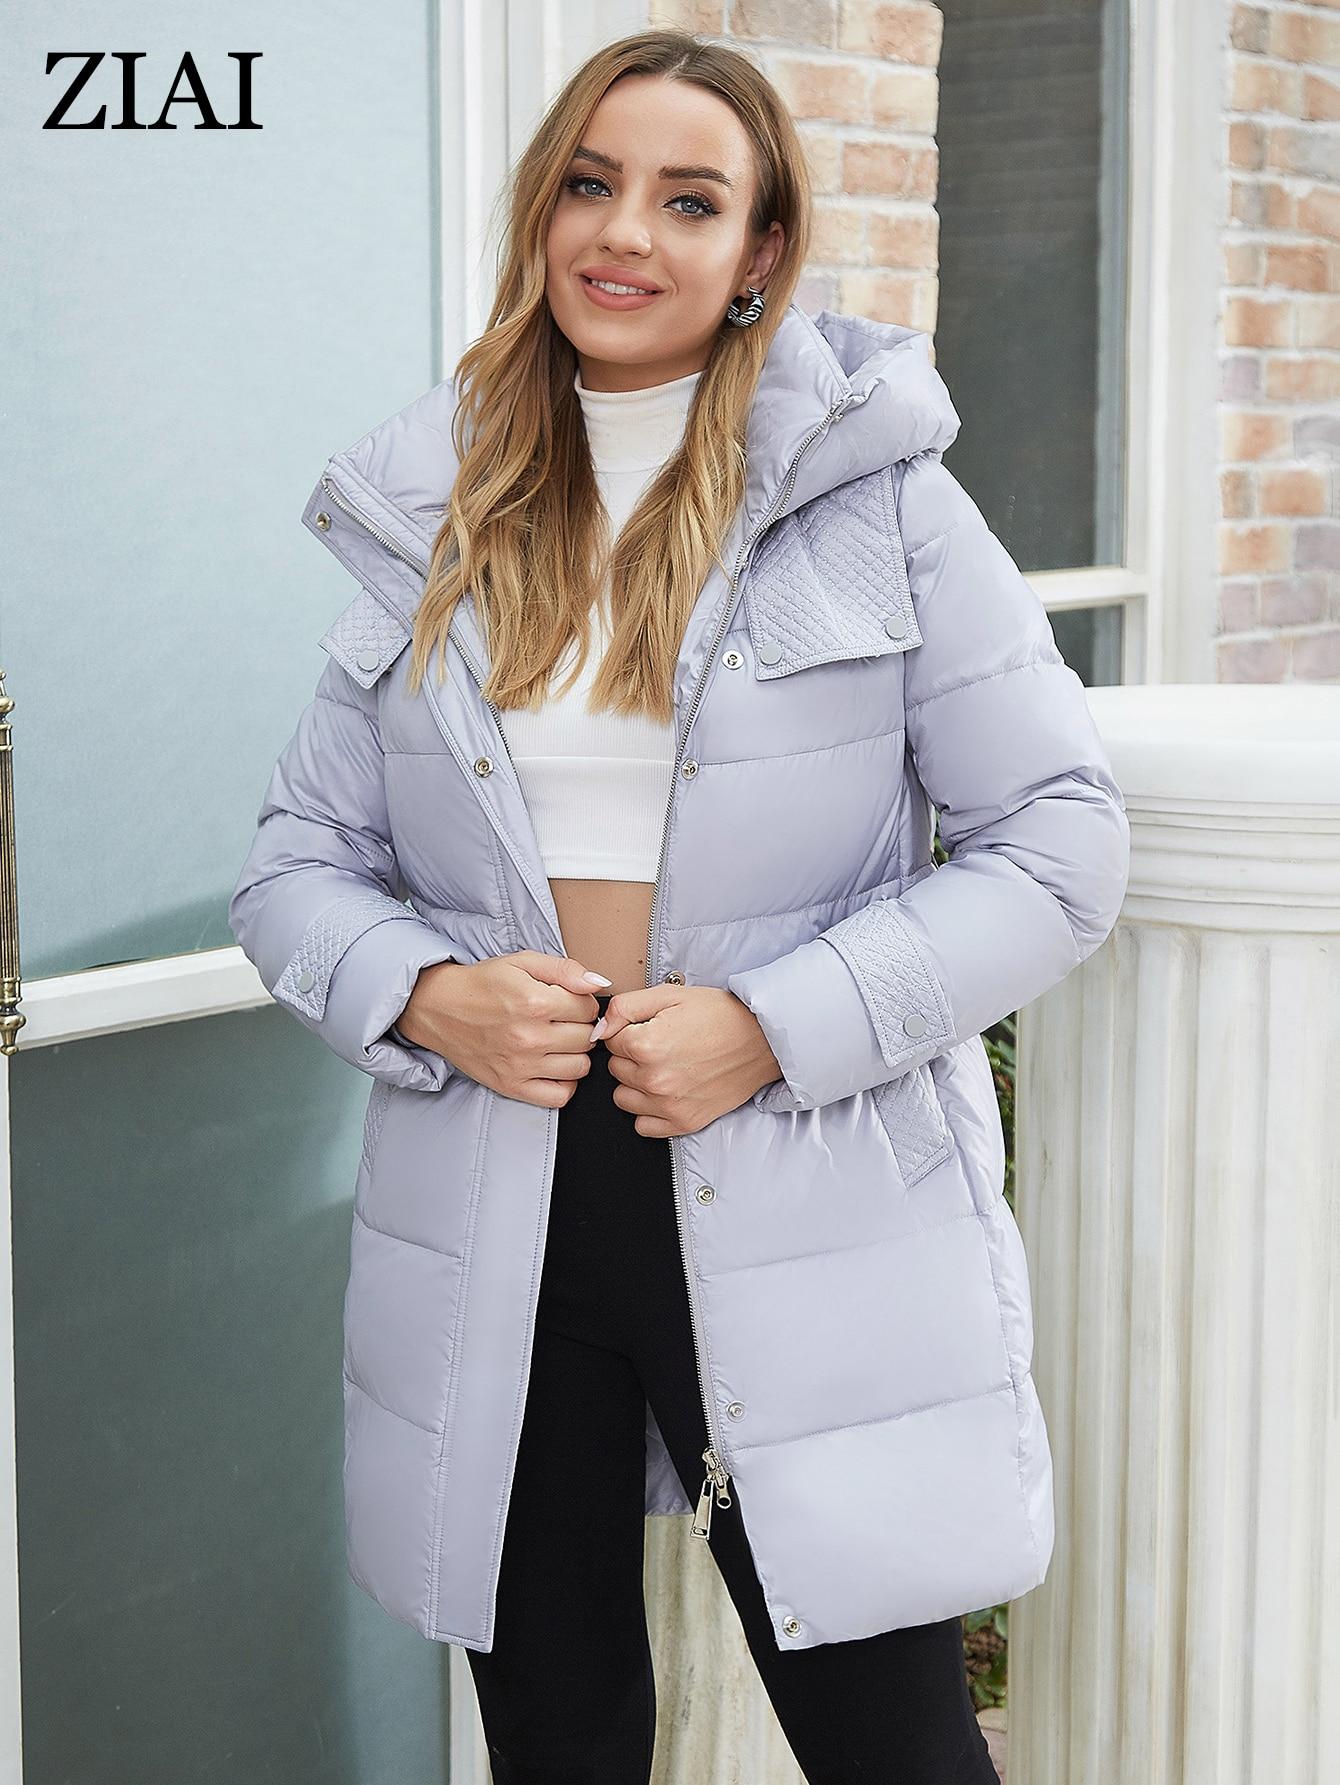 ZIAI 2021 New Winter Women's Jacket Simple Fashion slim Thick Women Coat mid-Long Parkas High-Qualit